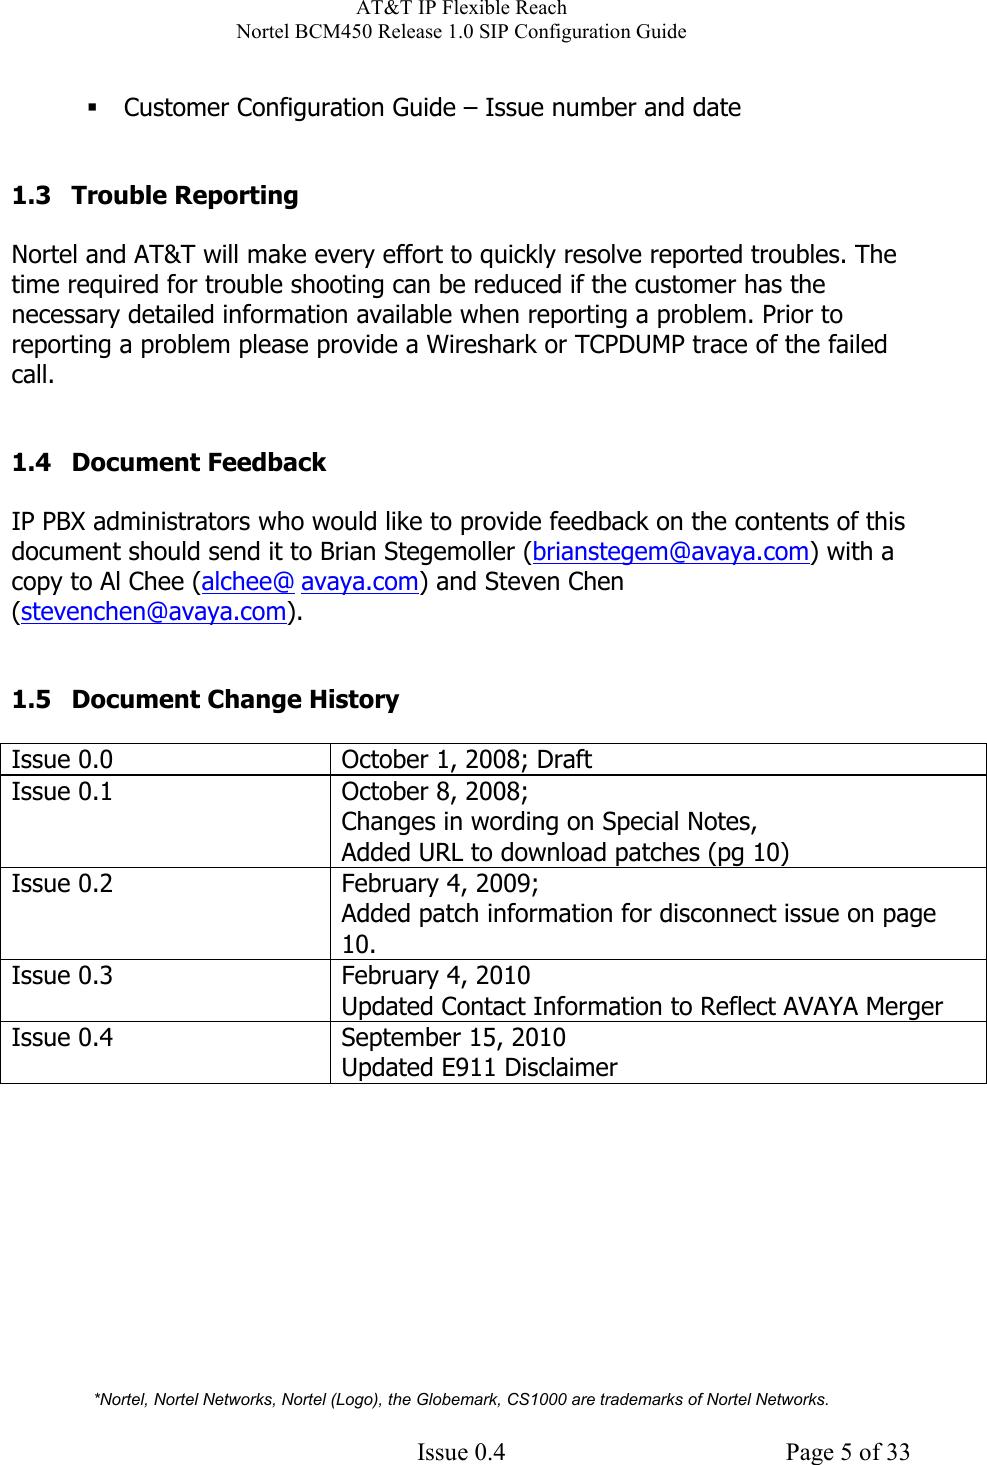 Avaya Nortel Bcm450 Release 1 0 Sip Configuration Guide